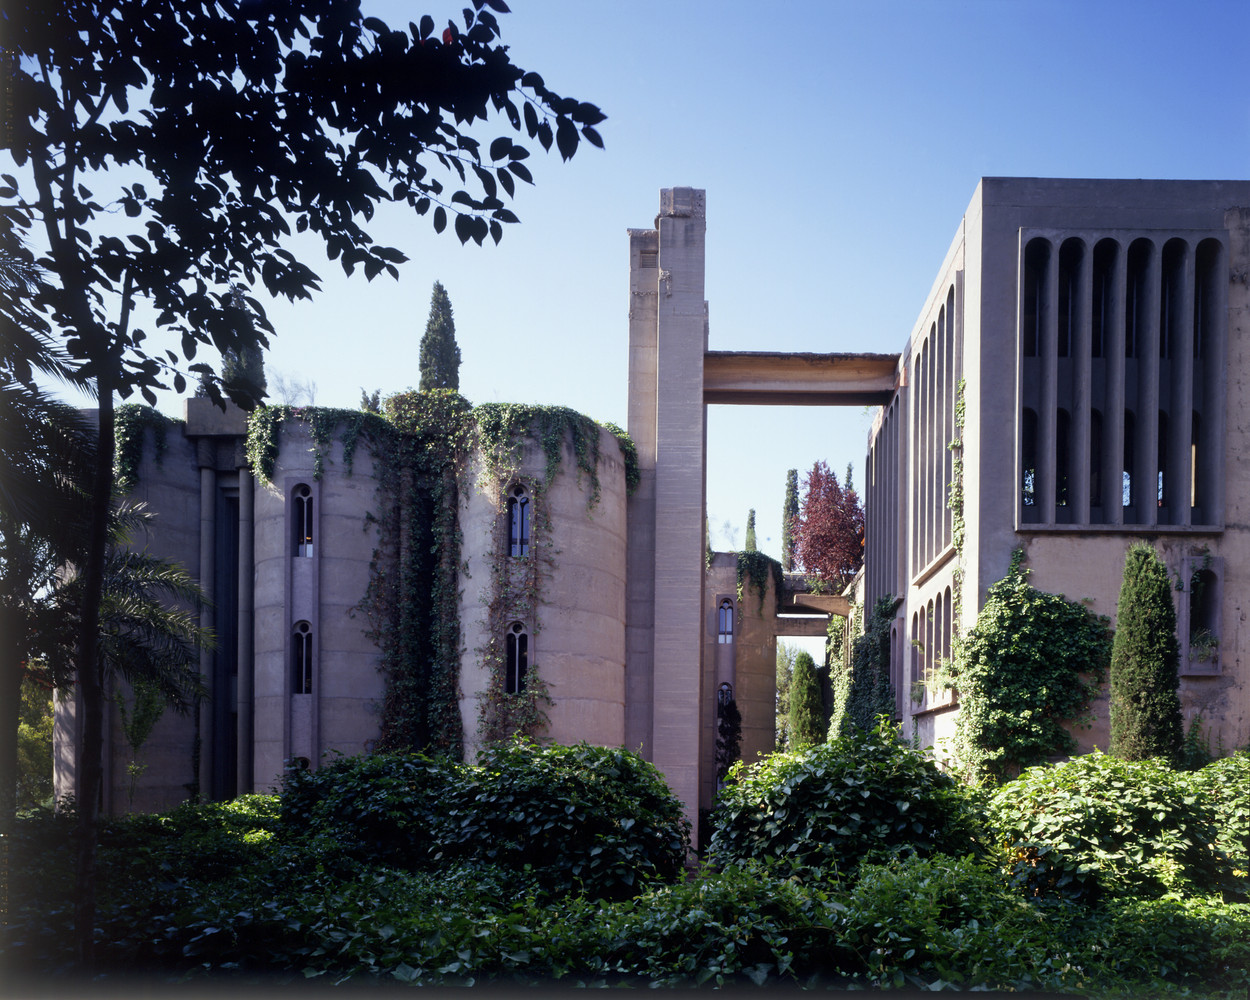 Ricardo_Bofill_Taller_Arquitectura_SantJustDesvern_Barcelona_Spain_OutdoorSpaces_(2).jpg